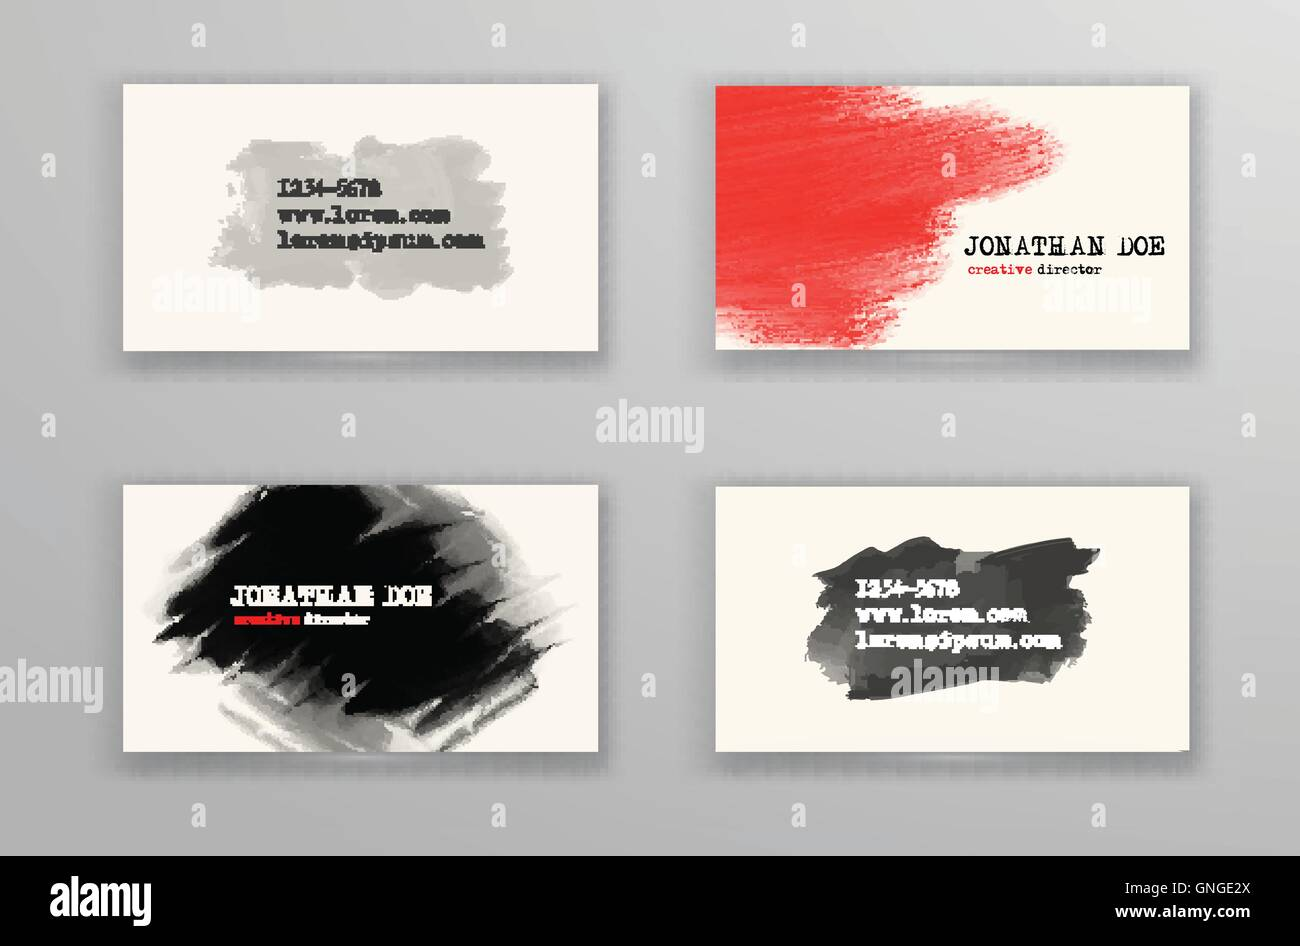 creative business card templates stock vector art illustration